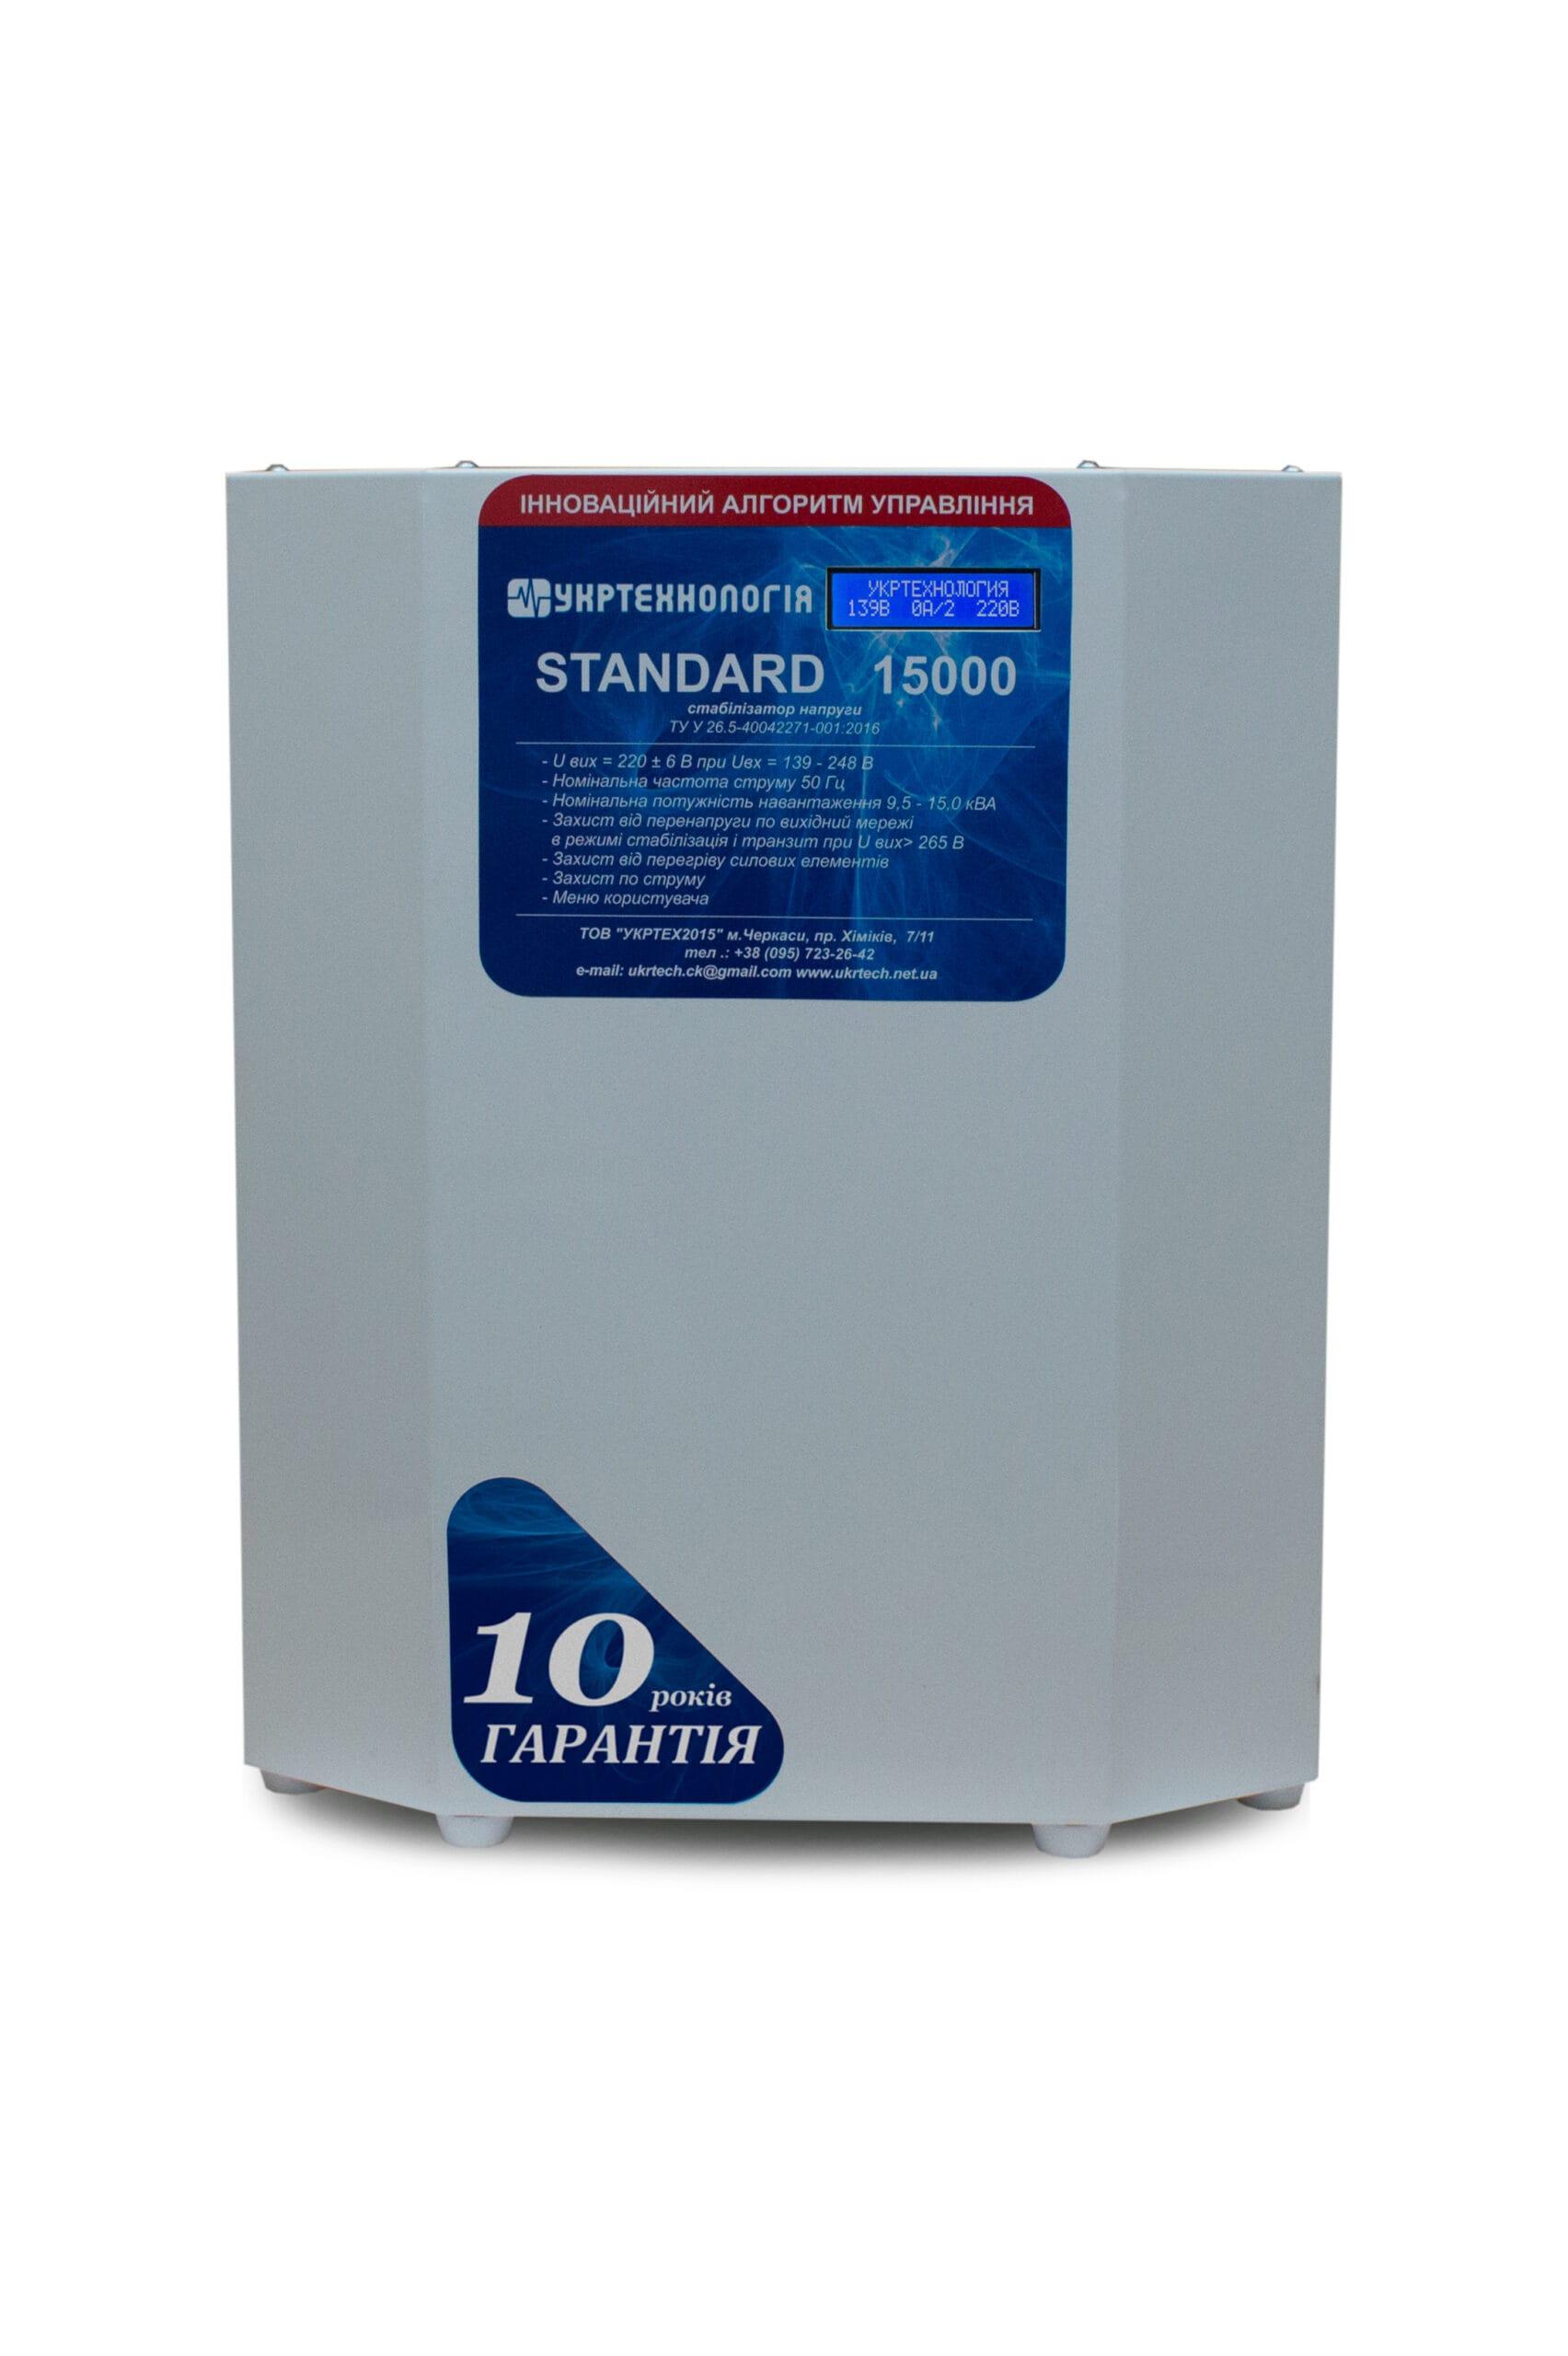 Стабилизаторы напряжения - Стабилизатор напряжения 15 кВт STANDARD  000001400 - Фото 3